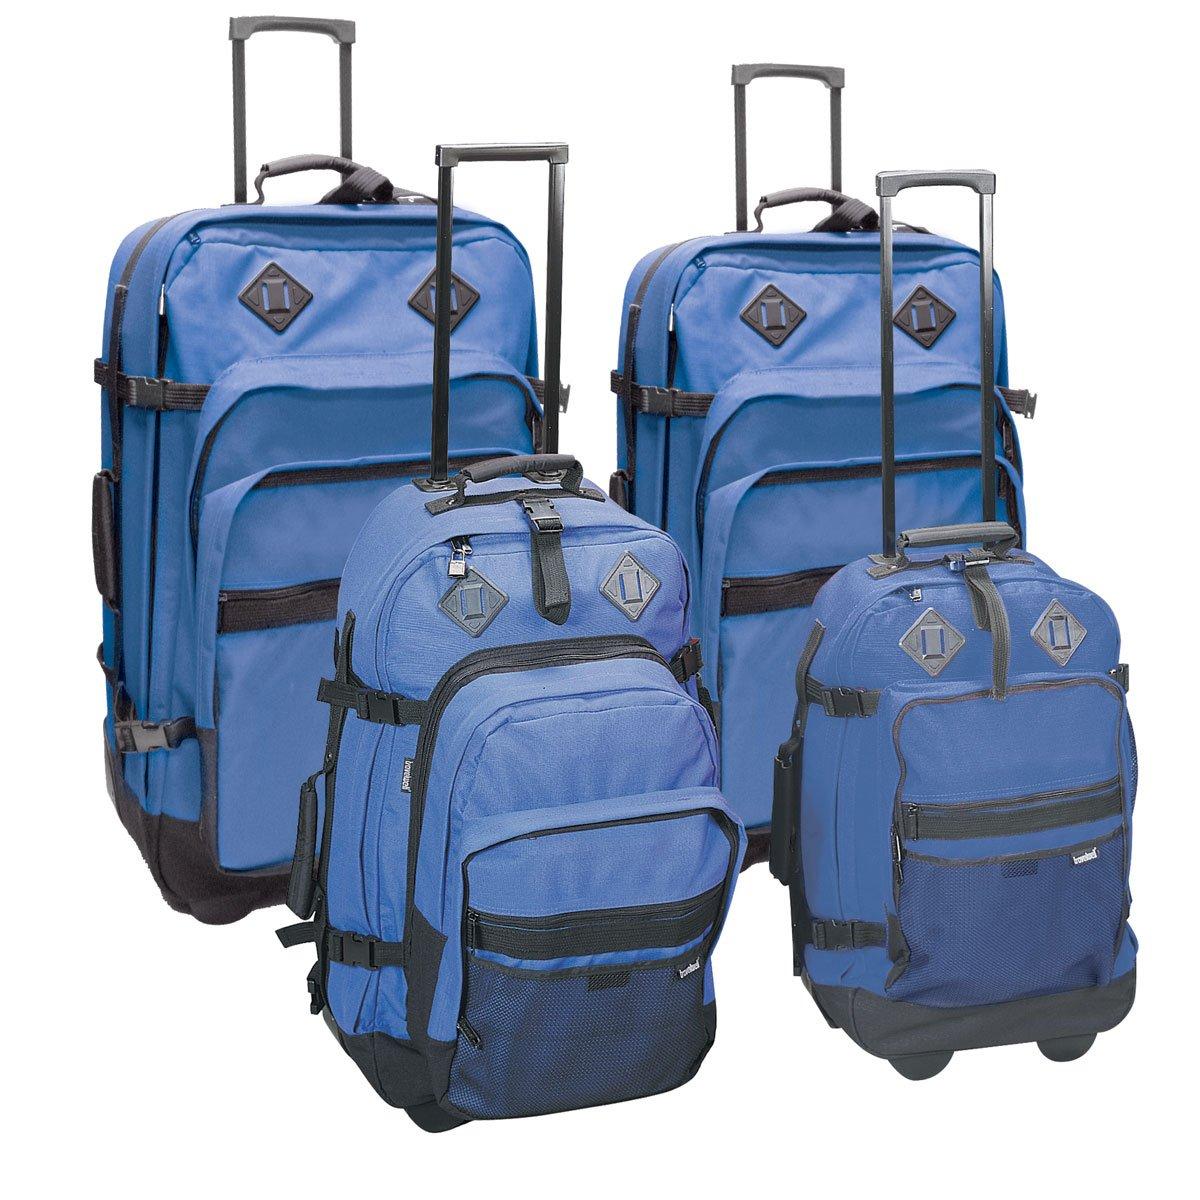 Outdoor Gear Upright 4 Piece Luggage Set Color Blue